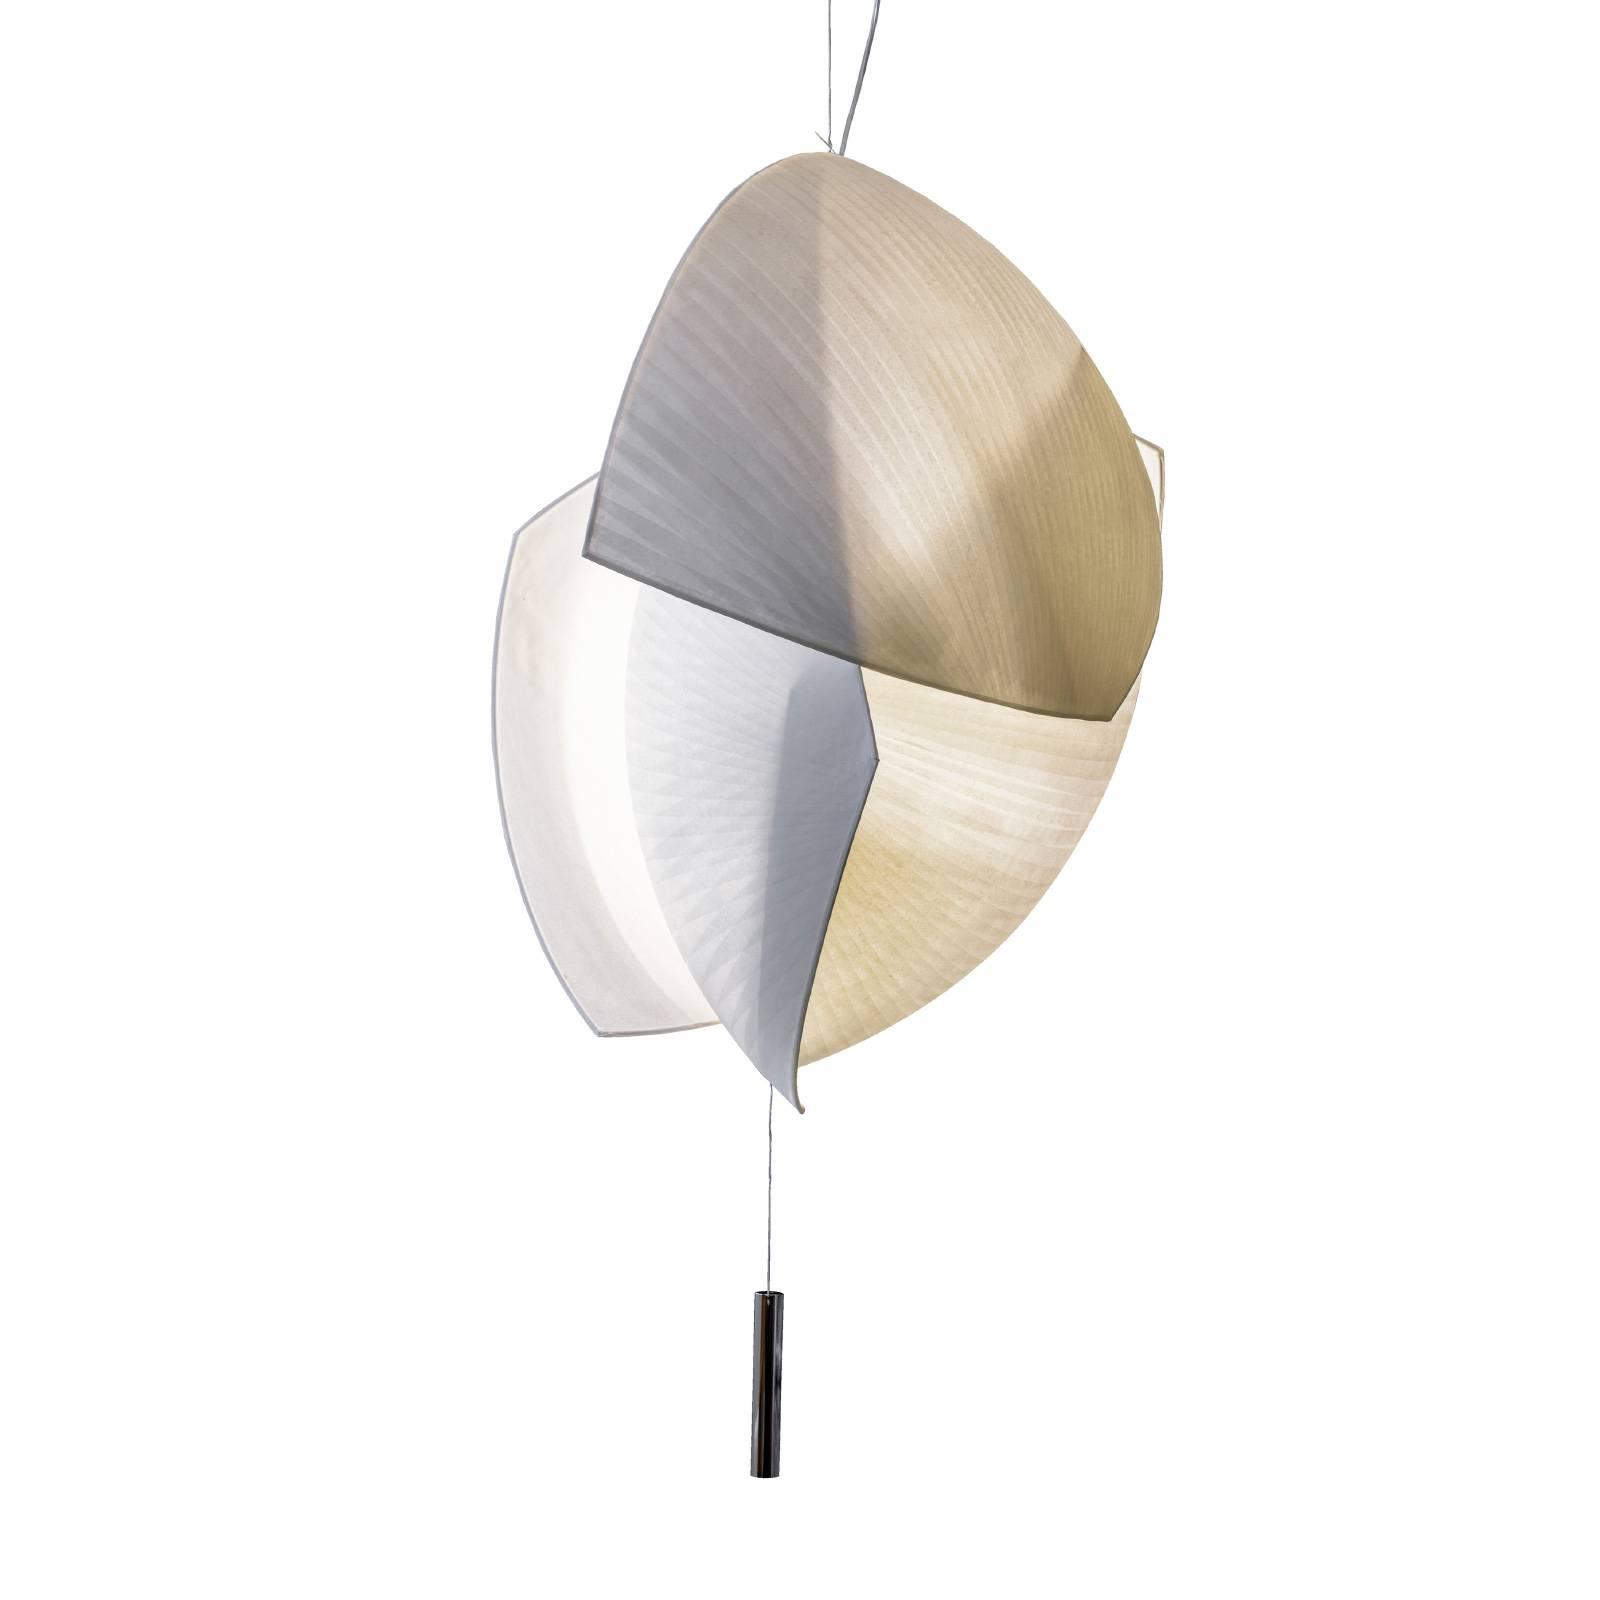 Grok Voiles LED hanglamp 95x70 cm, dimbaar DALI